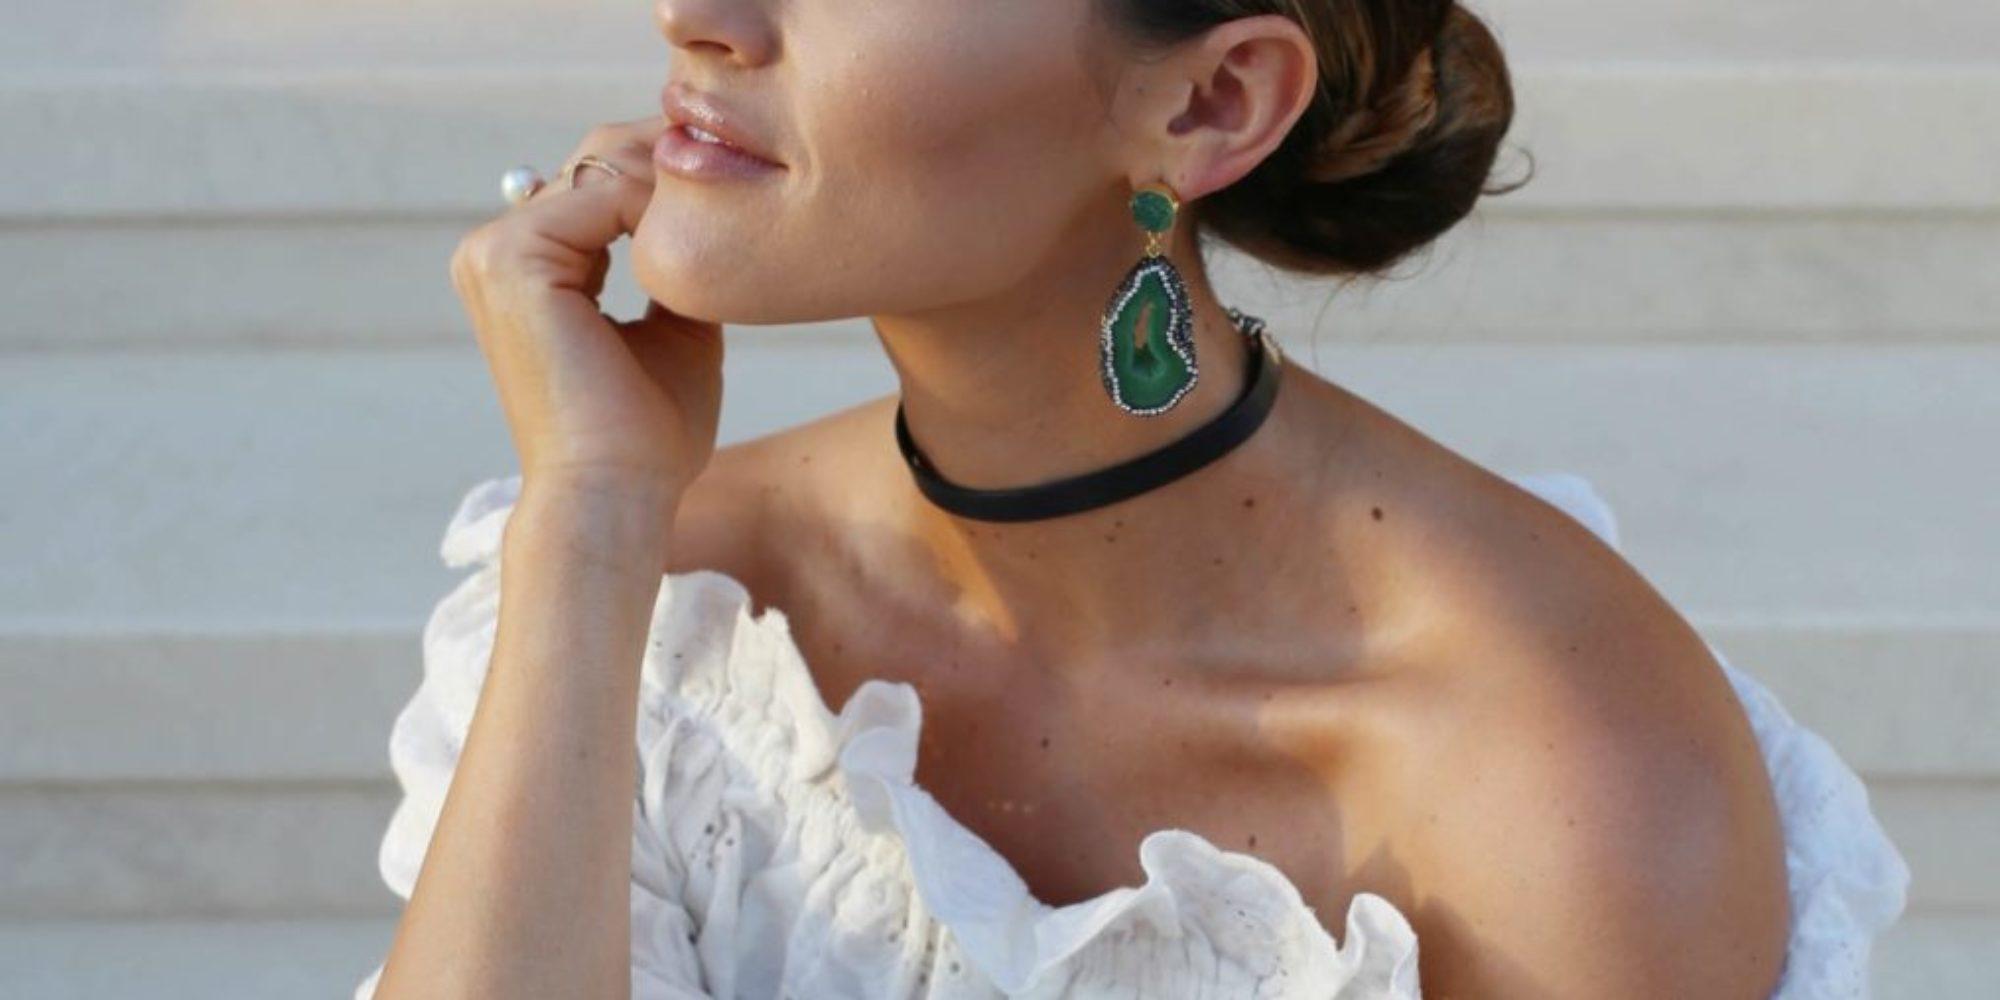 hawaii_off-the-shoulder_emerald-green_sbk_7-edit